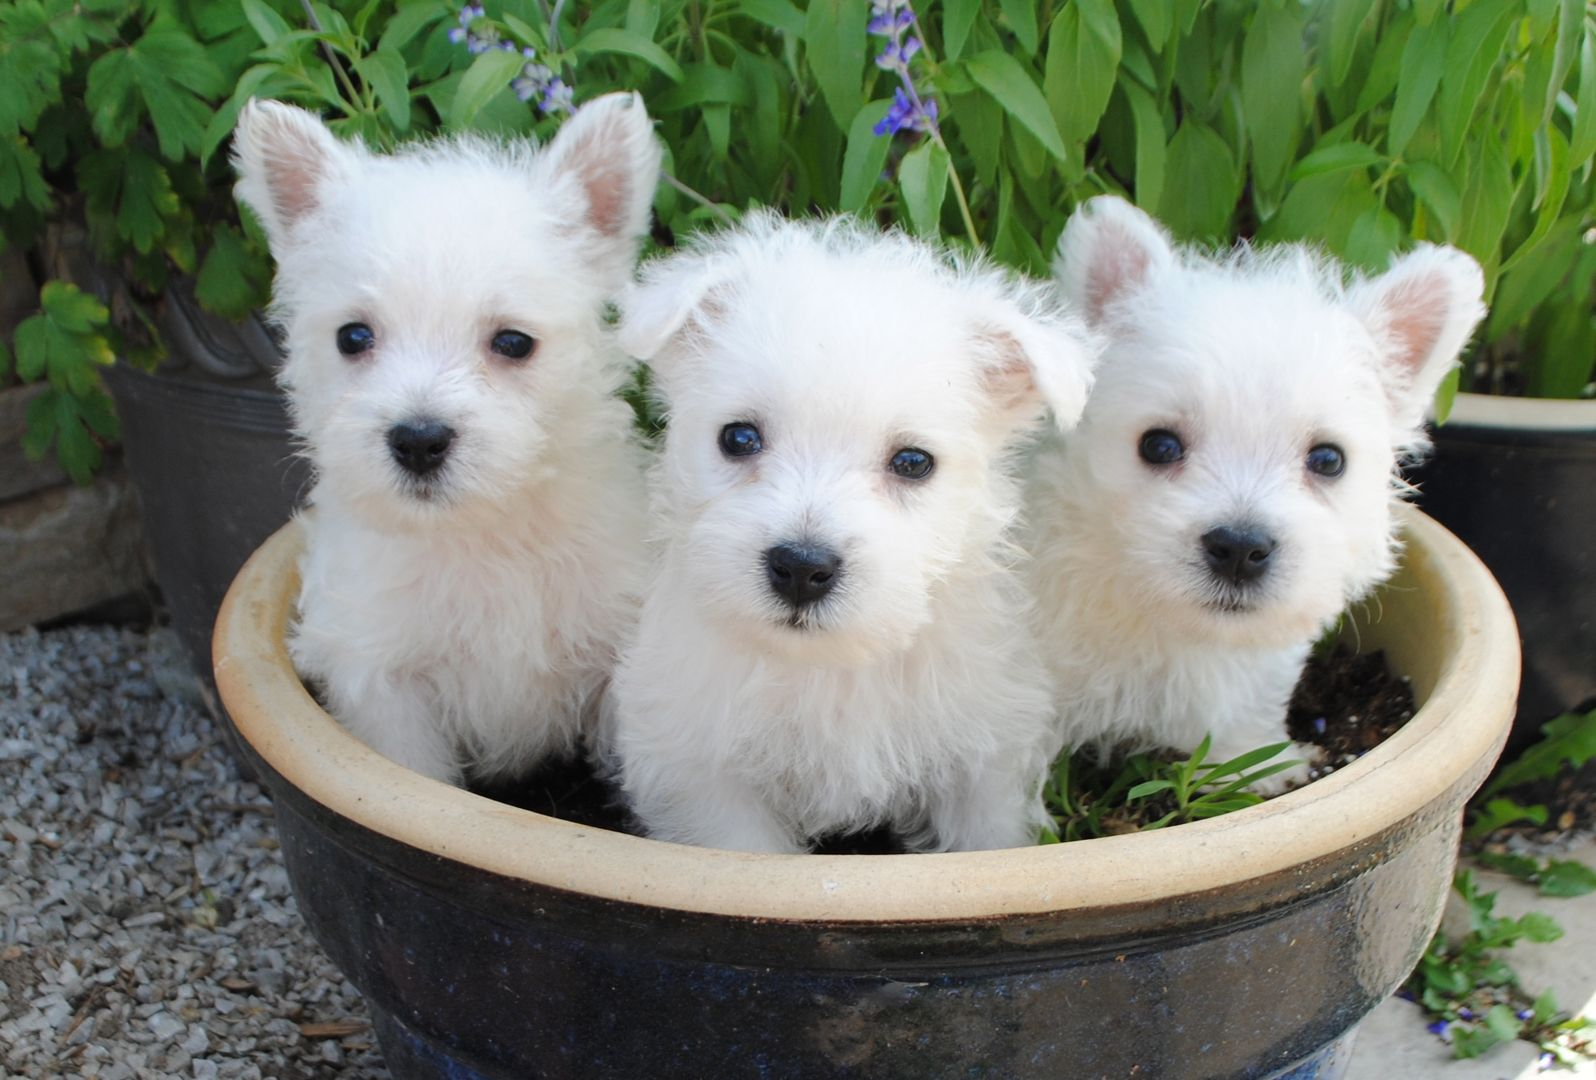 Bb41544f373692b767862195b7fecf68 1596 1080 West Highland White Terrier White Terrier West Highland Terrier